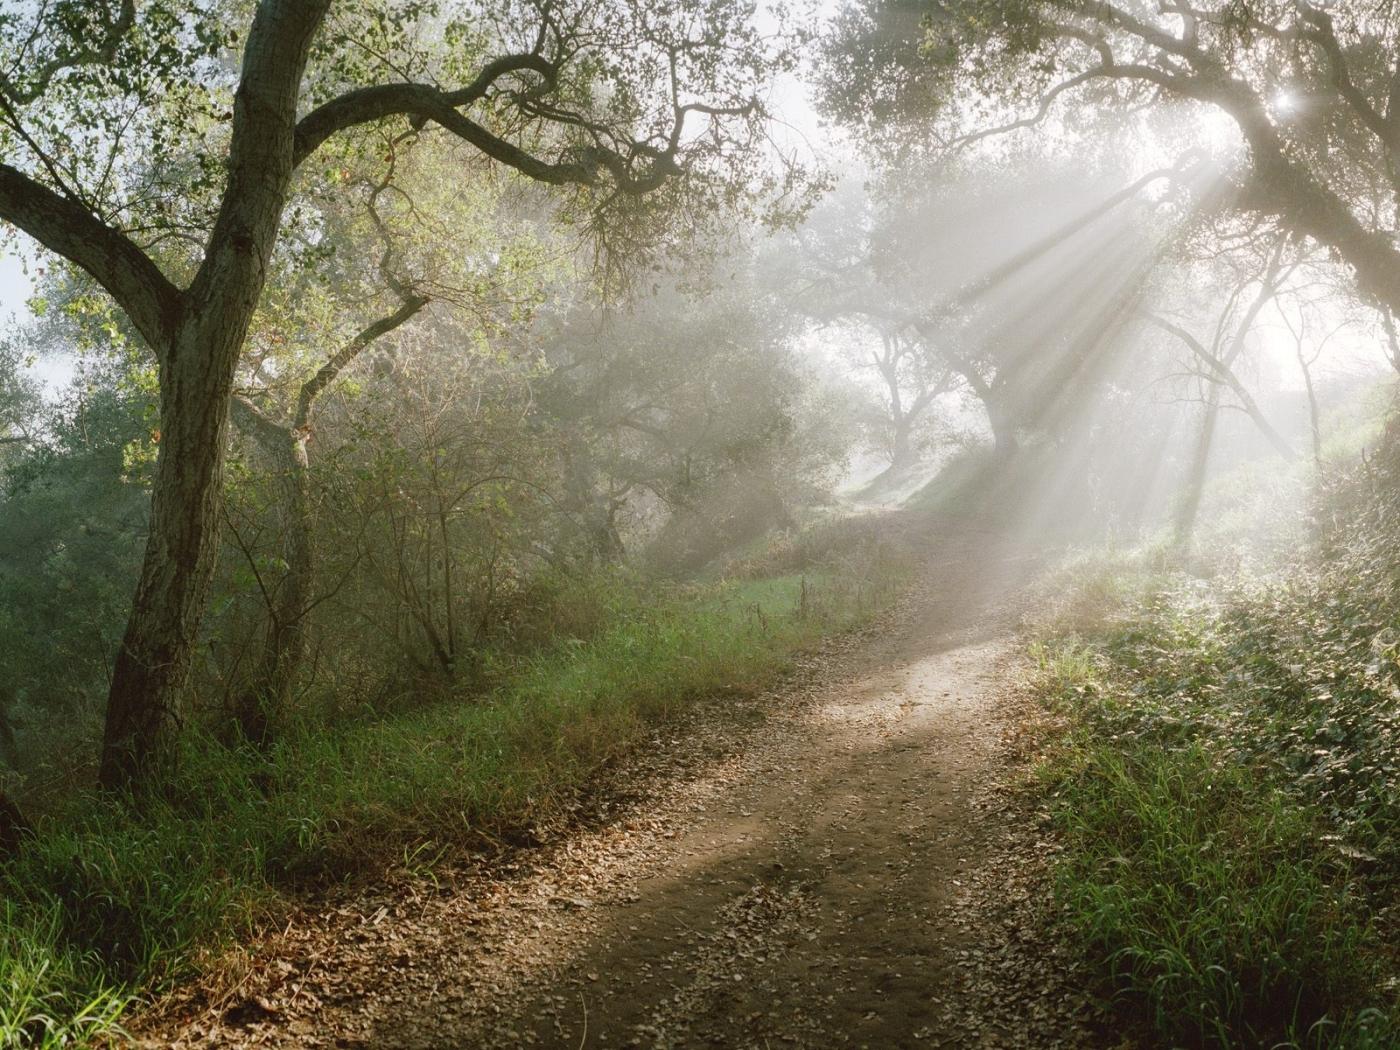 Handy-Wallpaper Landschaft, Bäume, Roads kostenlos herunterladen.